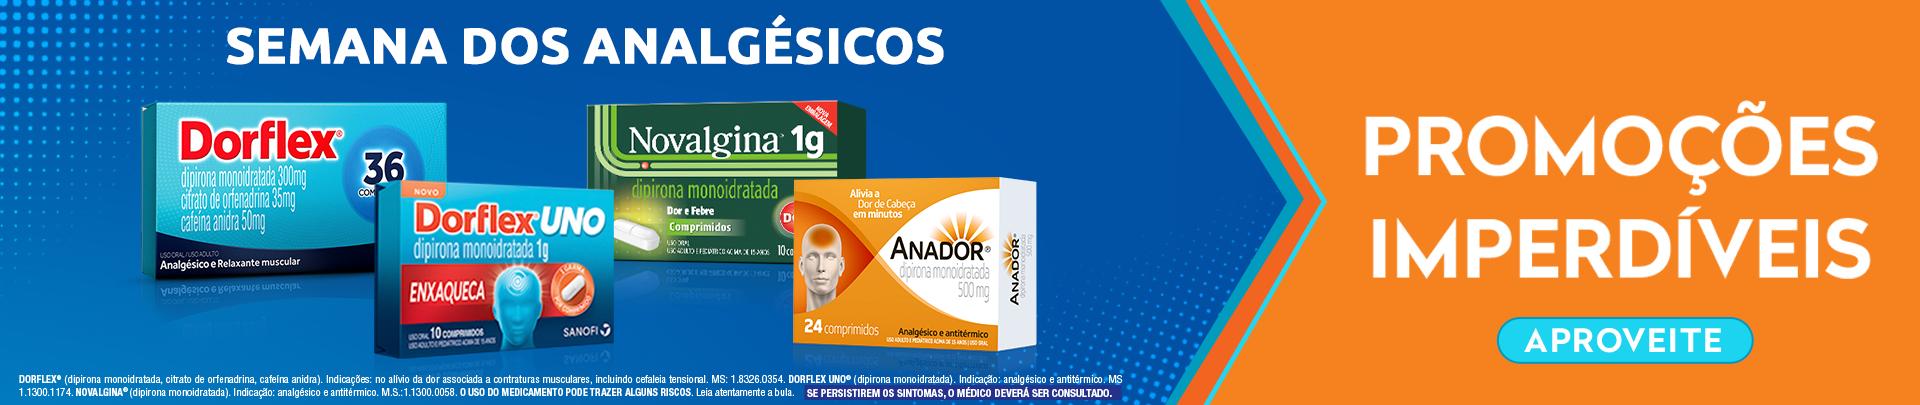 Analgésicos_Abril2021